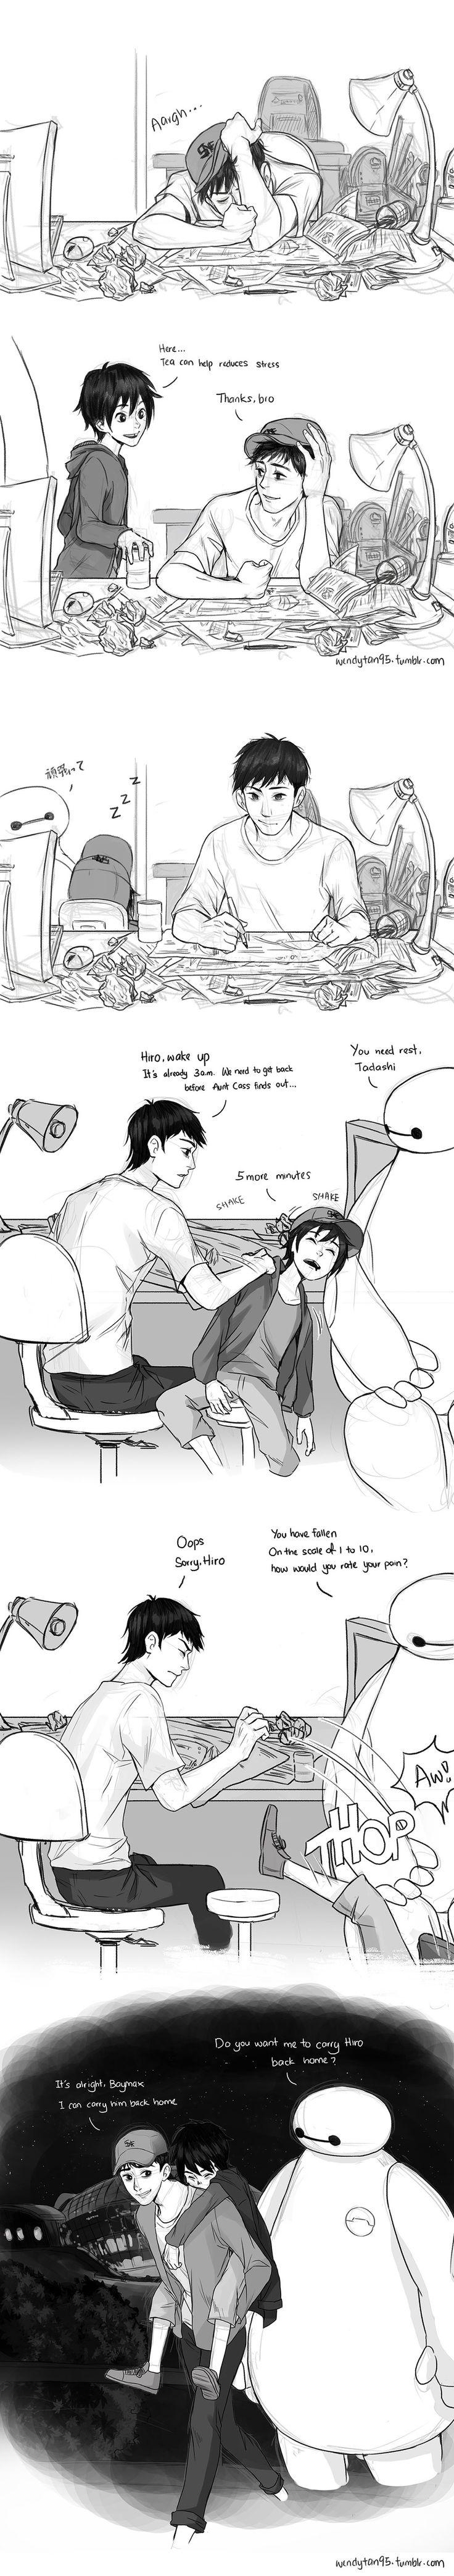 Stressing Tadashi by WendyTanSW.deviantart.com on @DeviantArt (In another life... *cries*)